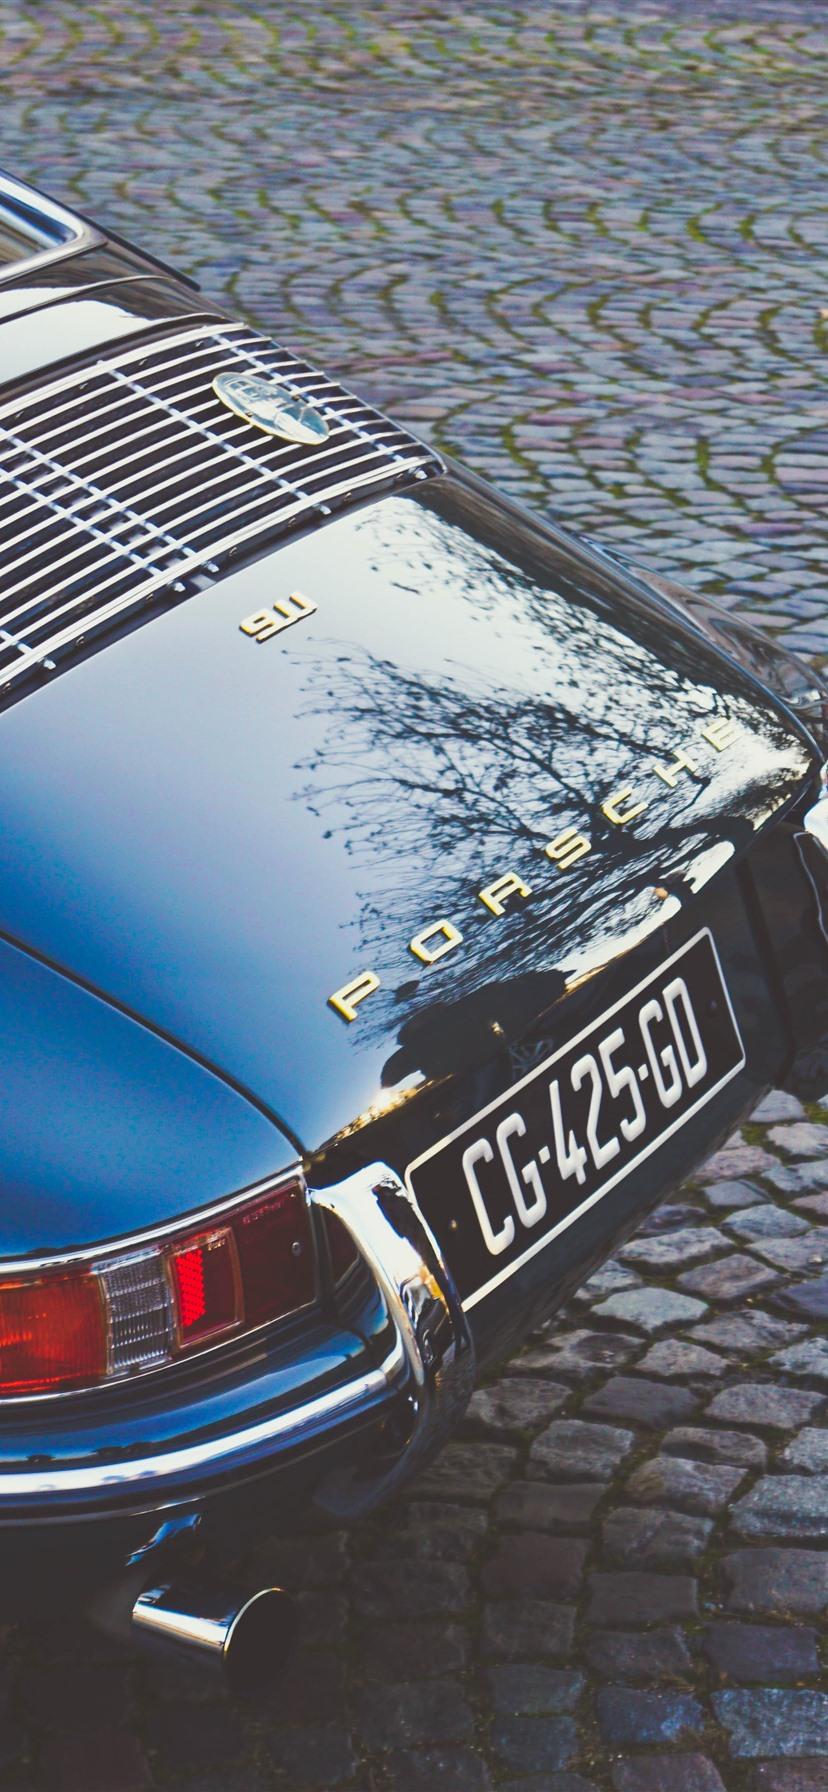 Porsche 911 Supercar Rear View Retro 1242x2688 Iphone 11 Pro Xs Max Wallpaper Background Picture Image